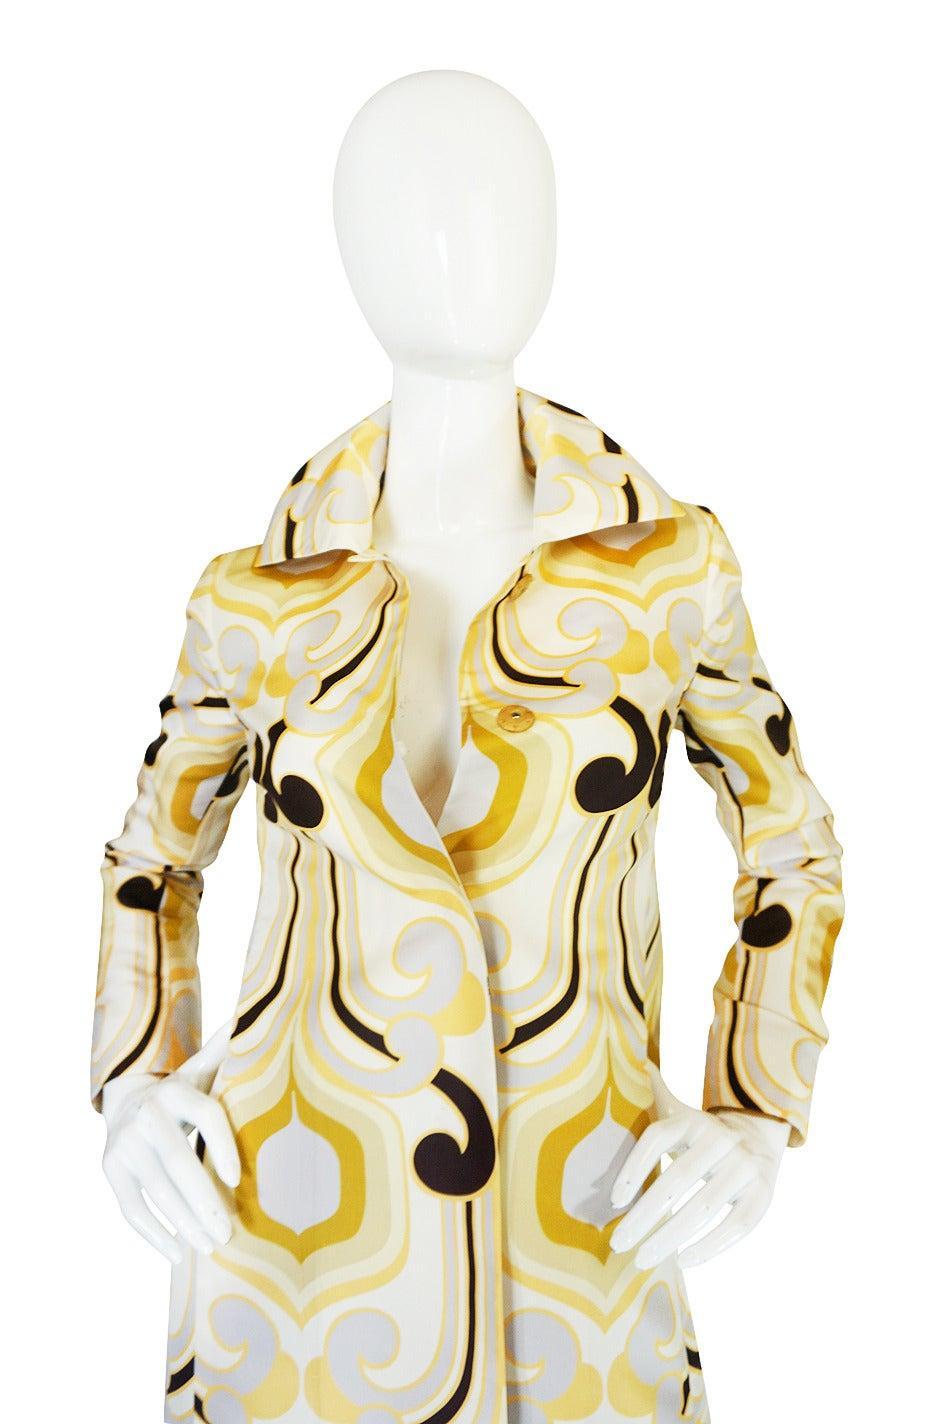 Miu Miu Runway Geometric Print Silk Coat, S/S 2005 For Sale 1